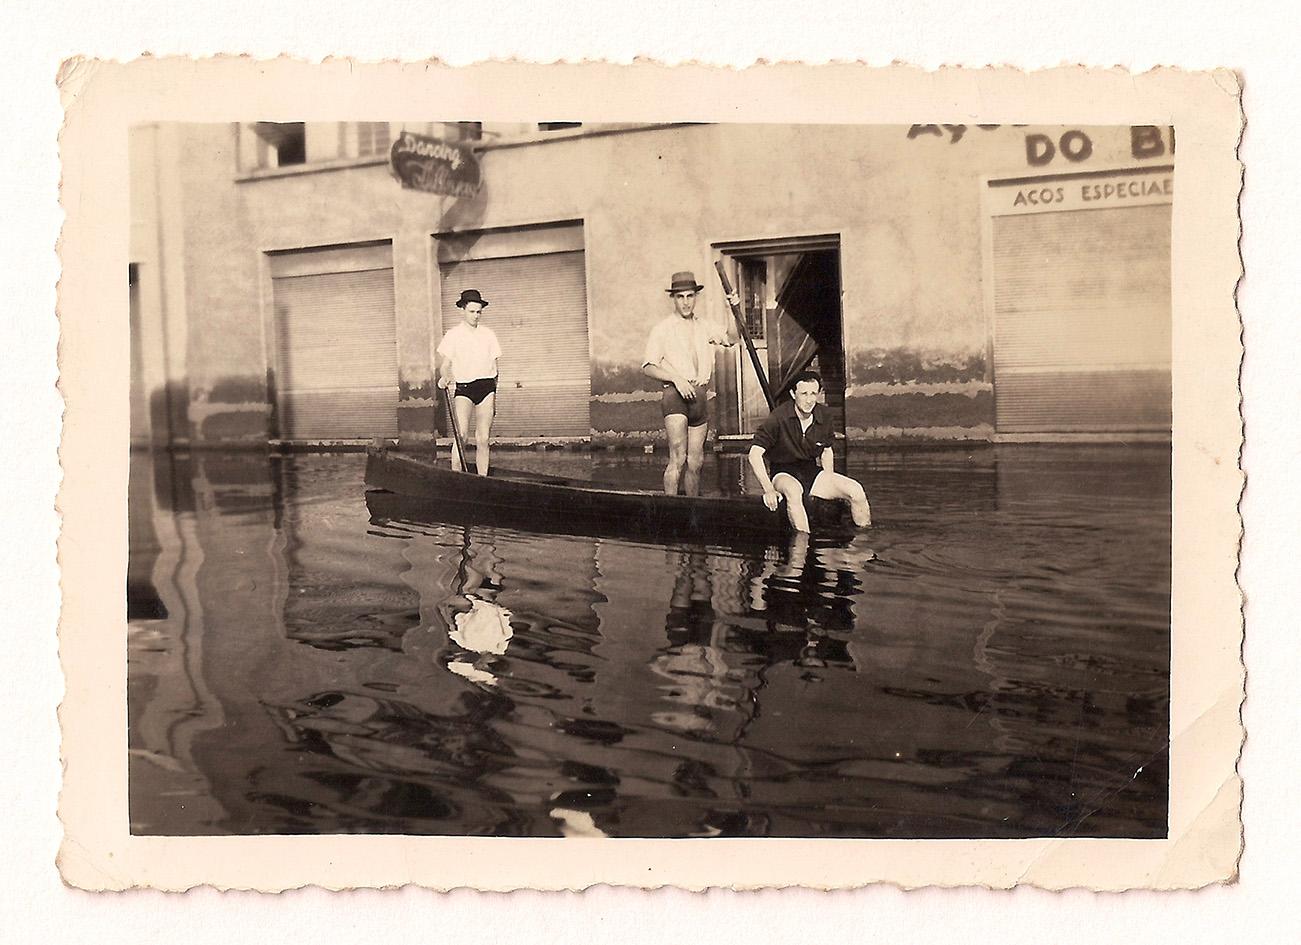 MAEL_PortoAlegre_1941_low